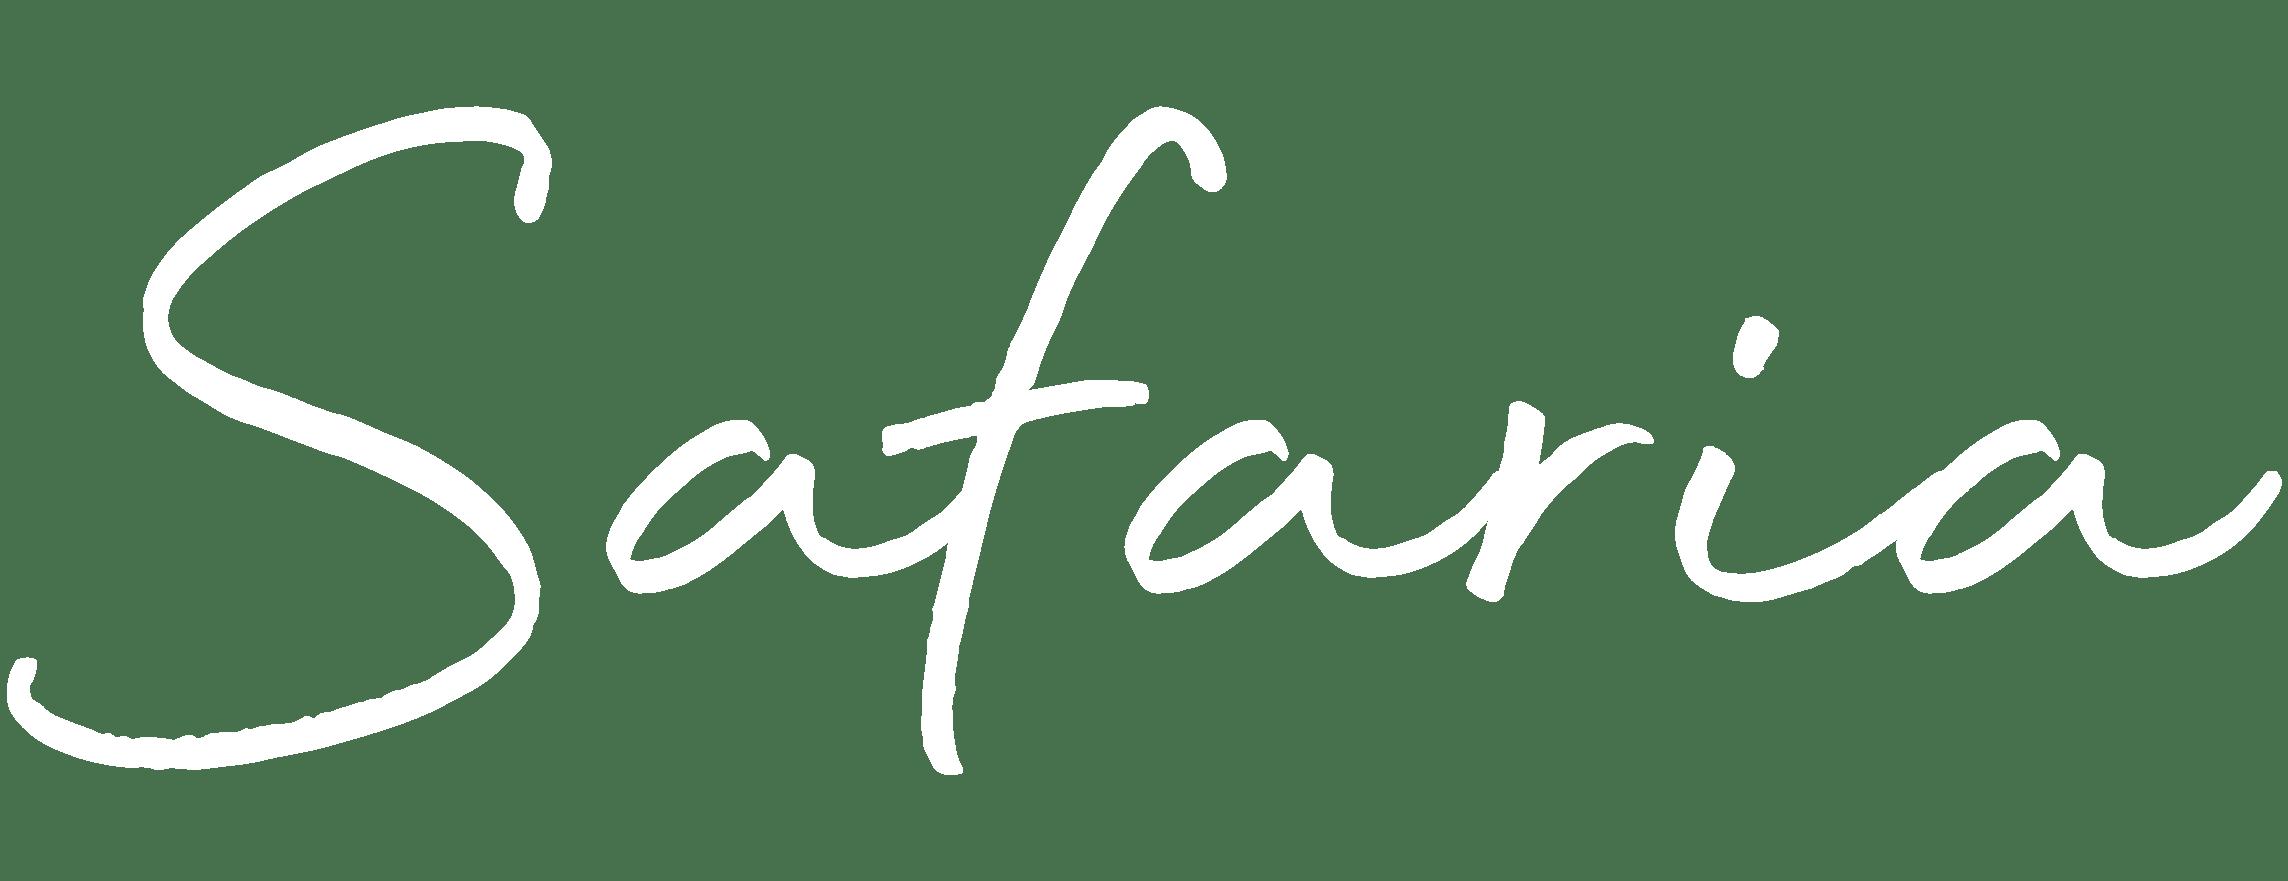 safaria logo